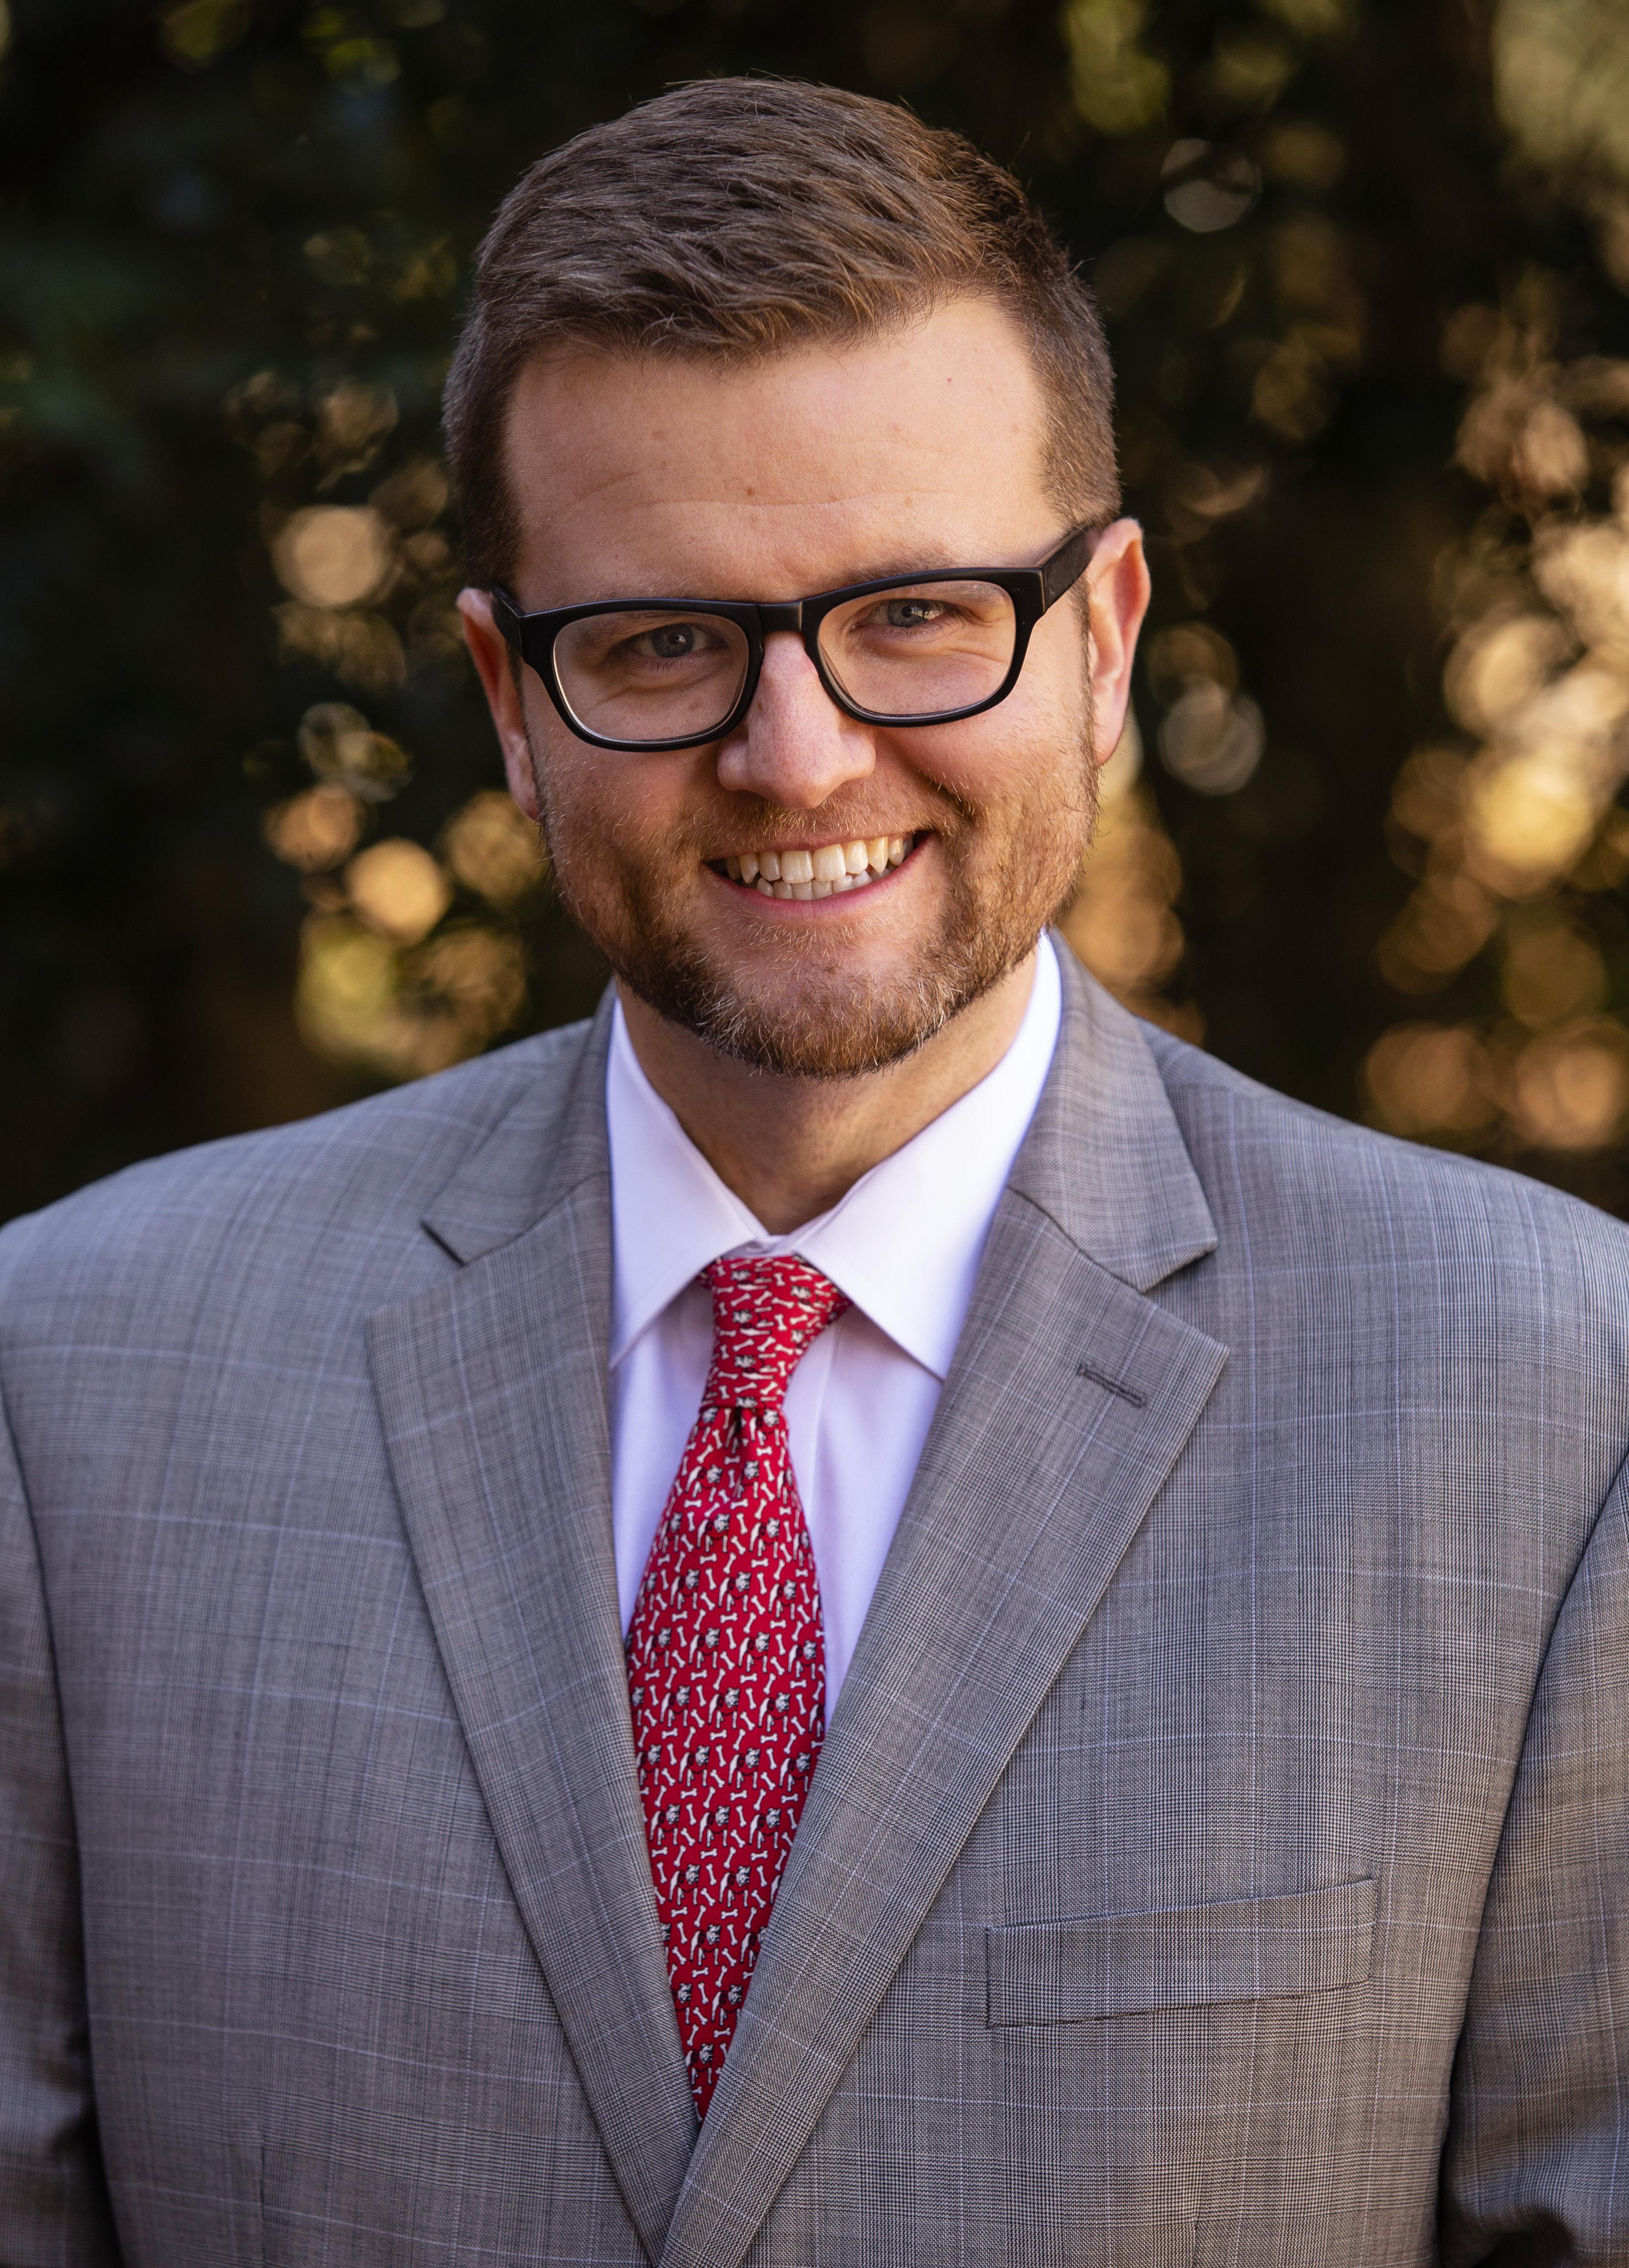 Alex C. Perry